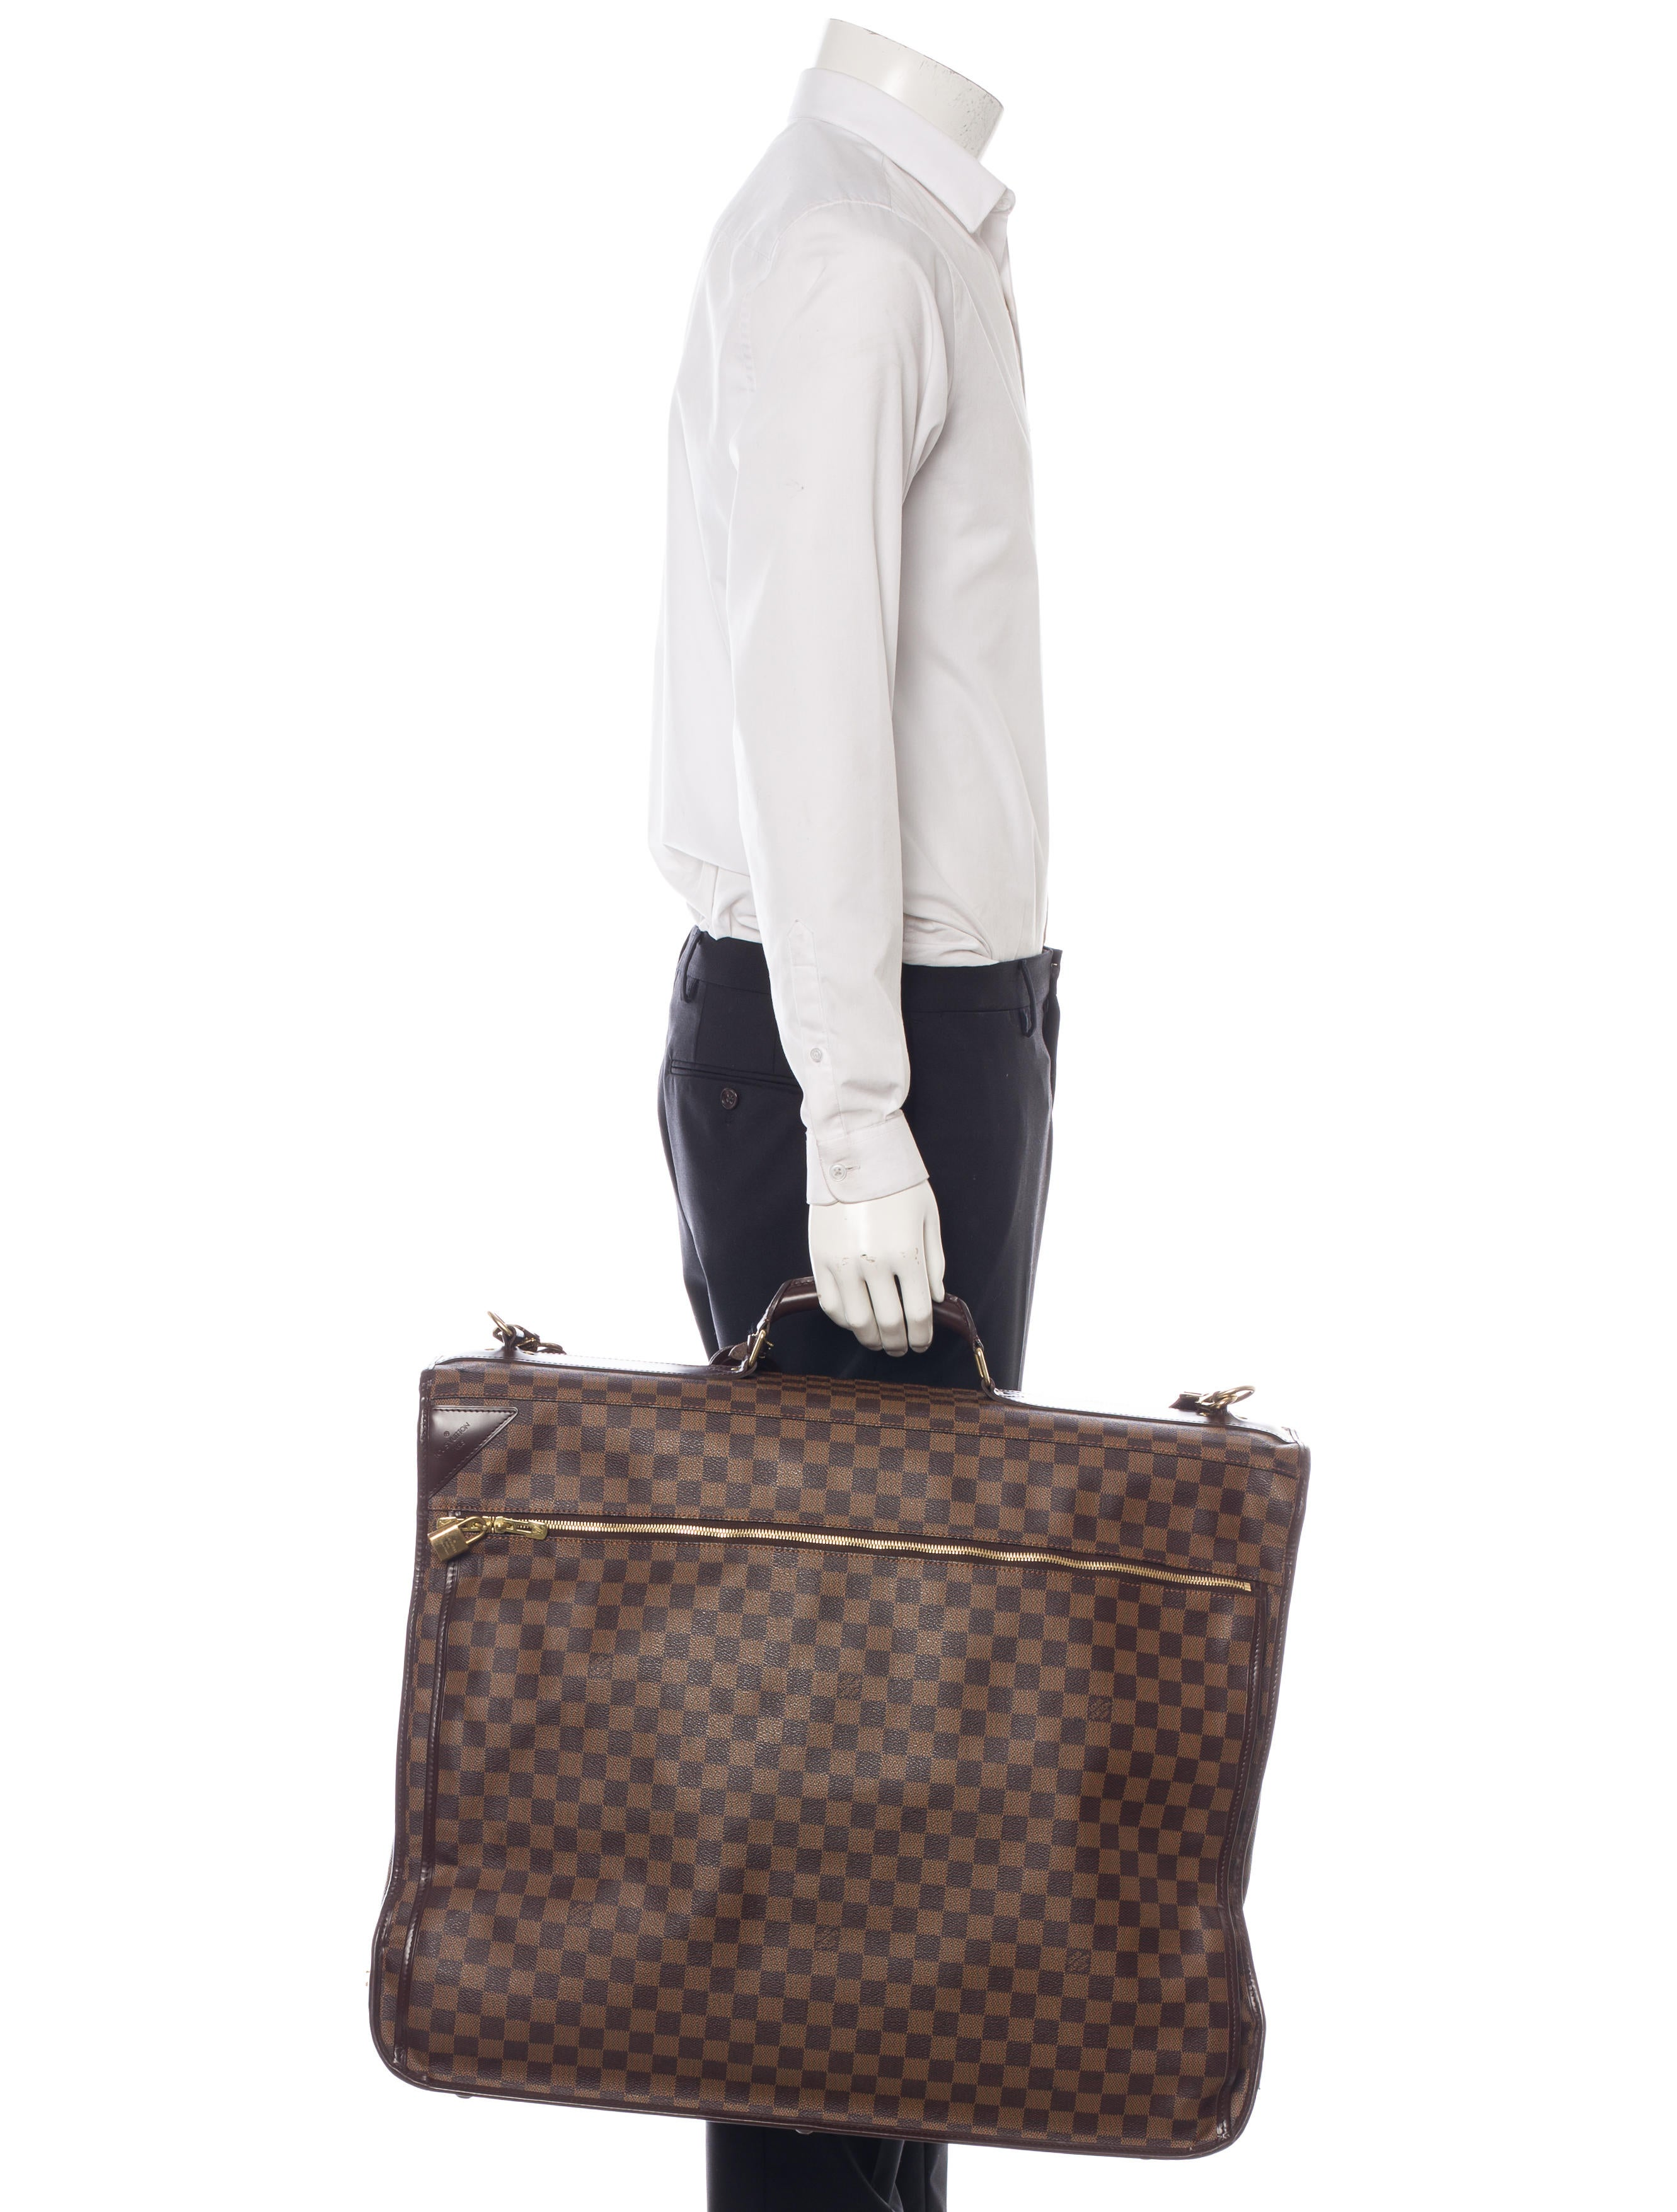 Louis Vuitton Damier Ebene Garment Cover Bags Lou84964